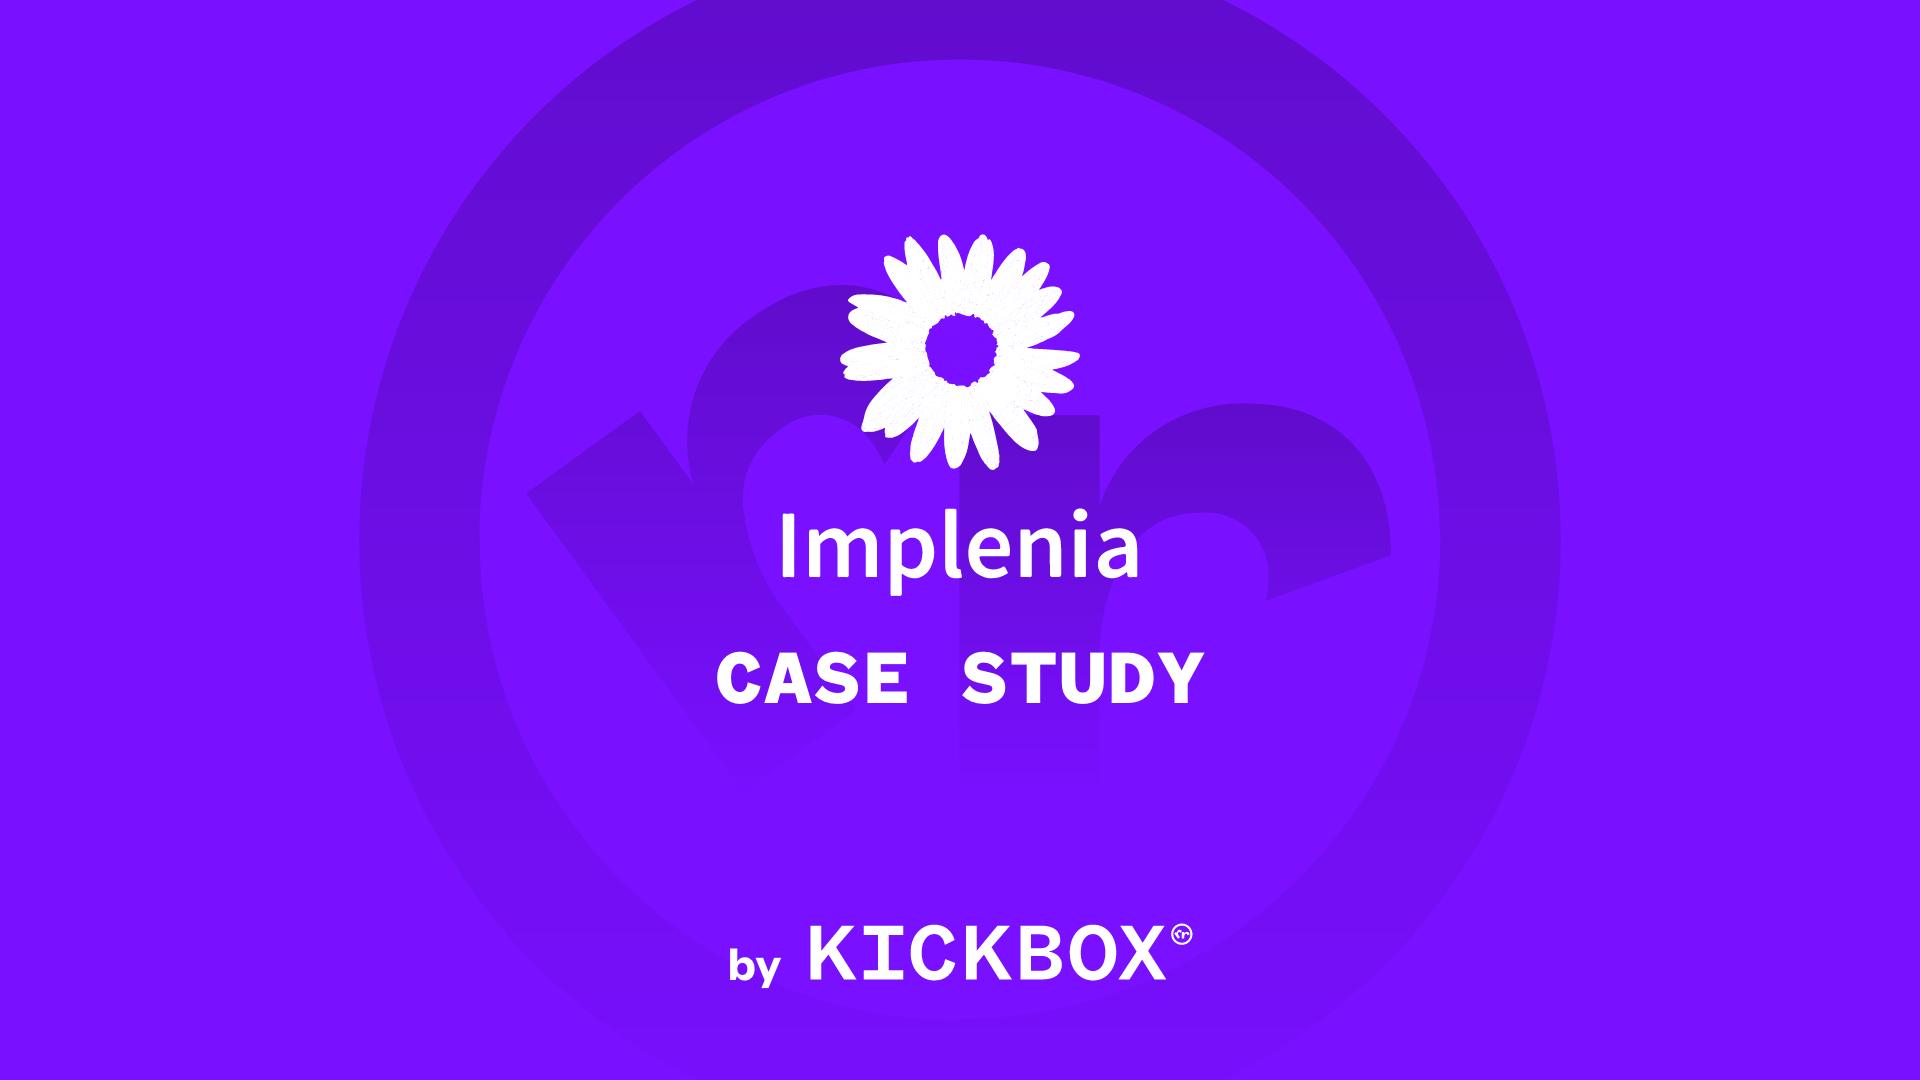 rready_Case_Study_Implenia